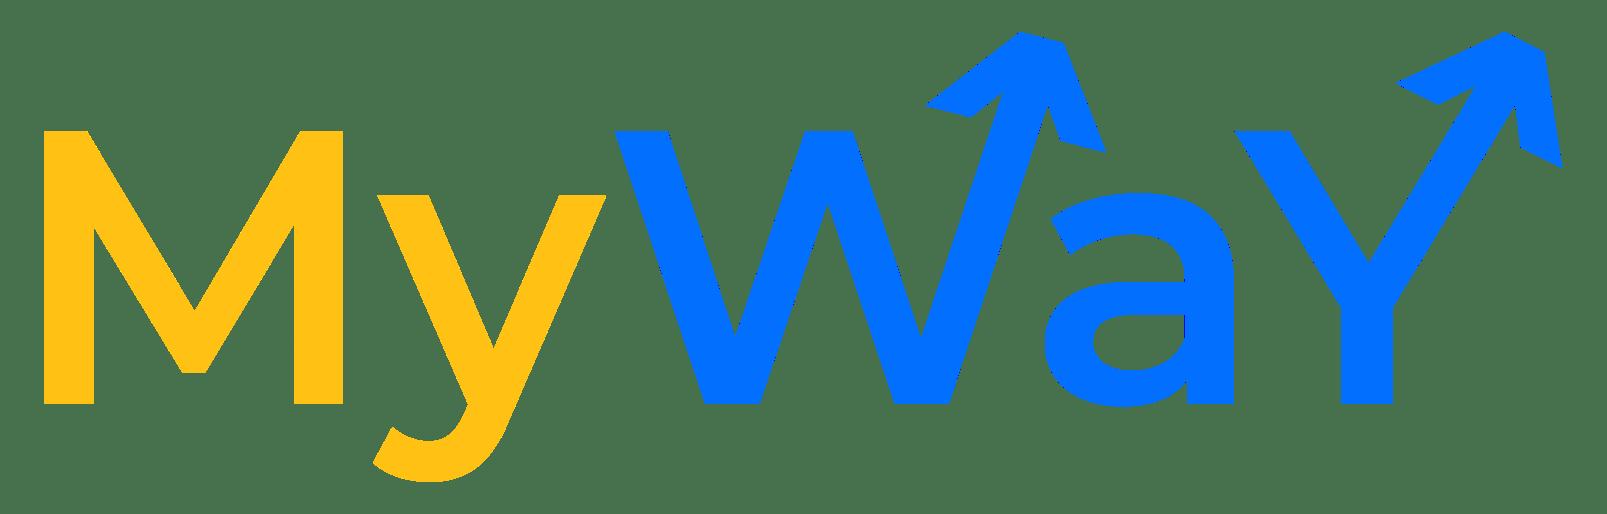 FEDEVO - My Way Logo